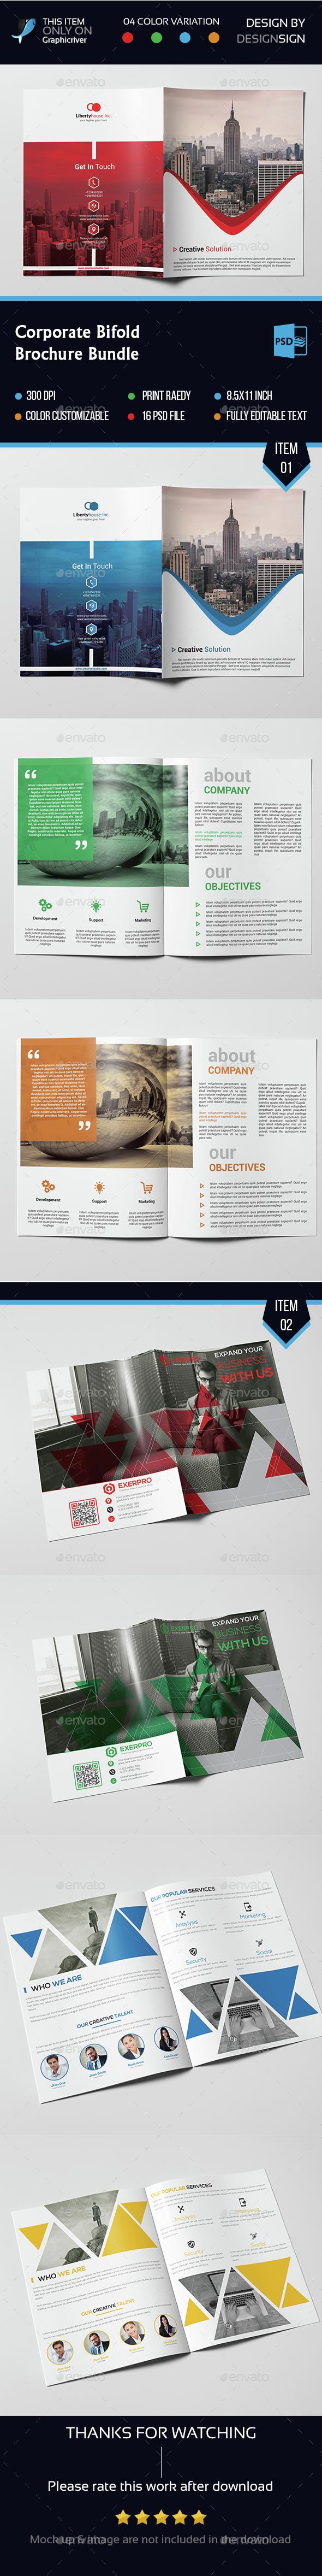 Corporate Bifold Brochure Bundle - Brochures Print Templates